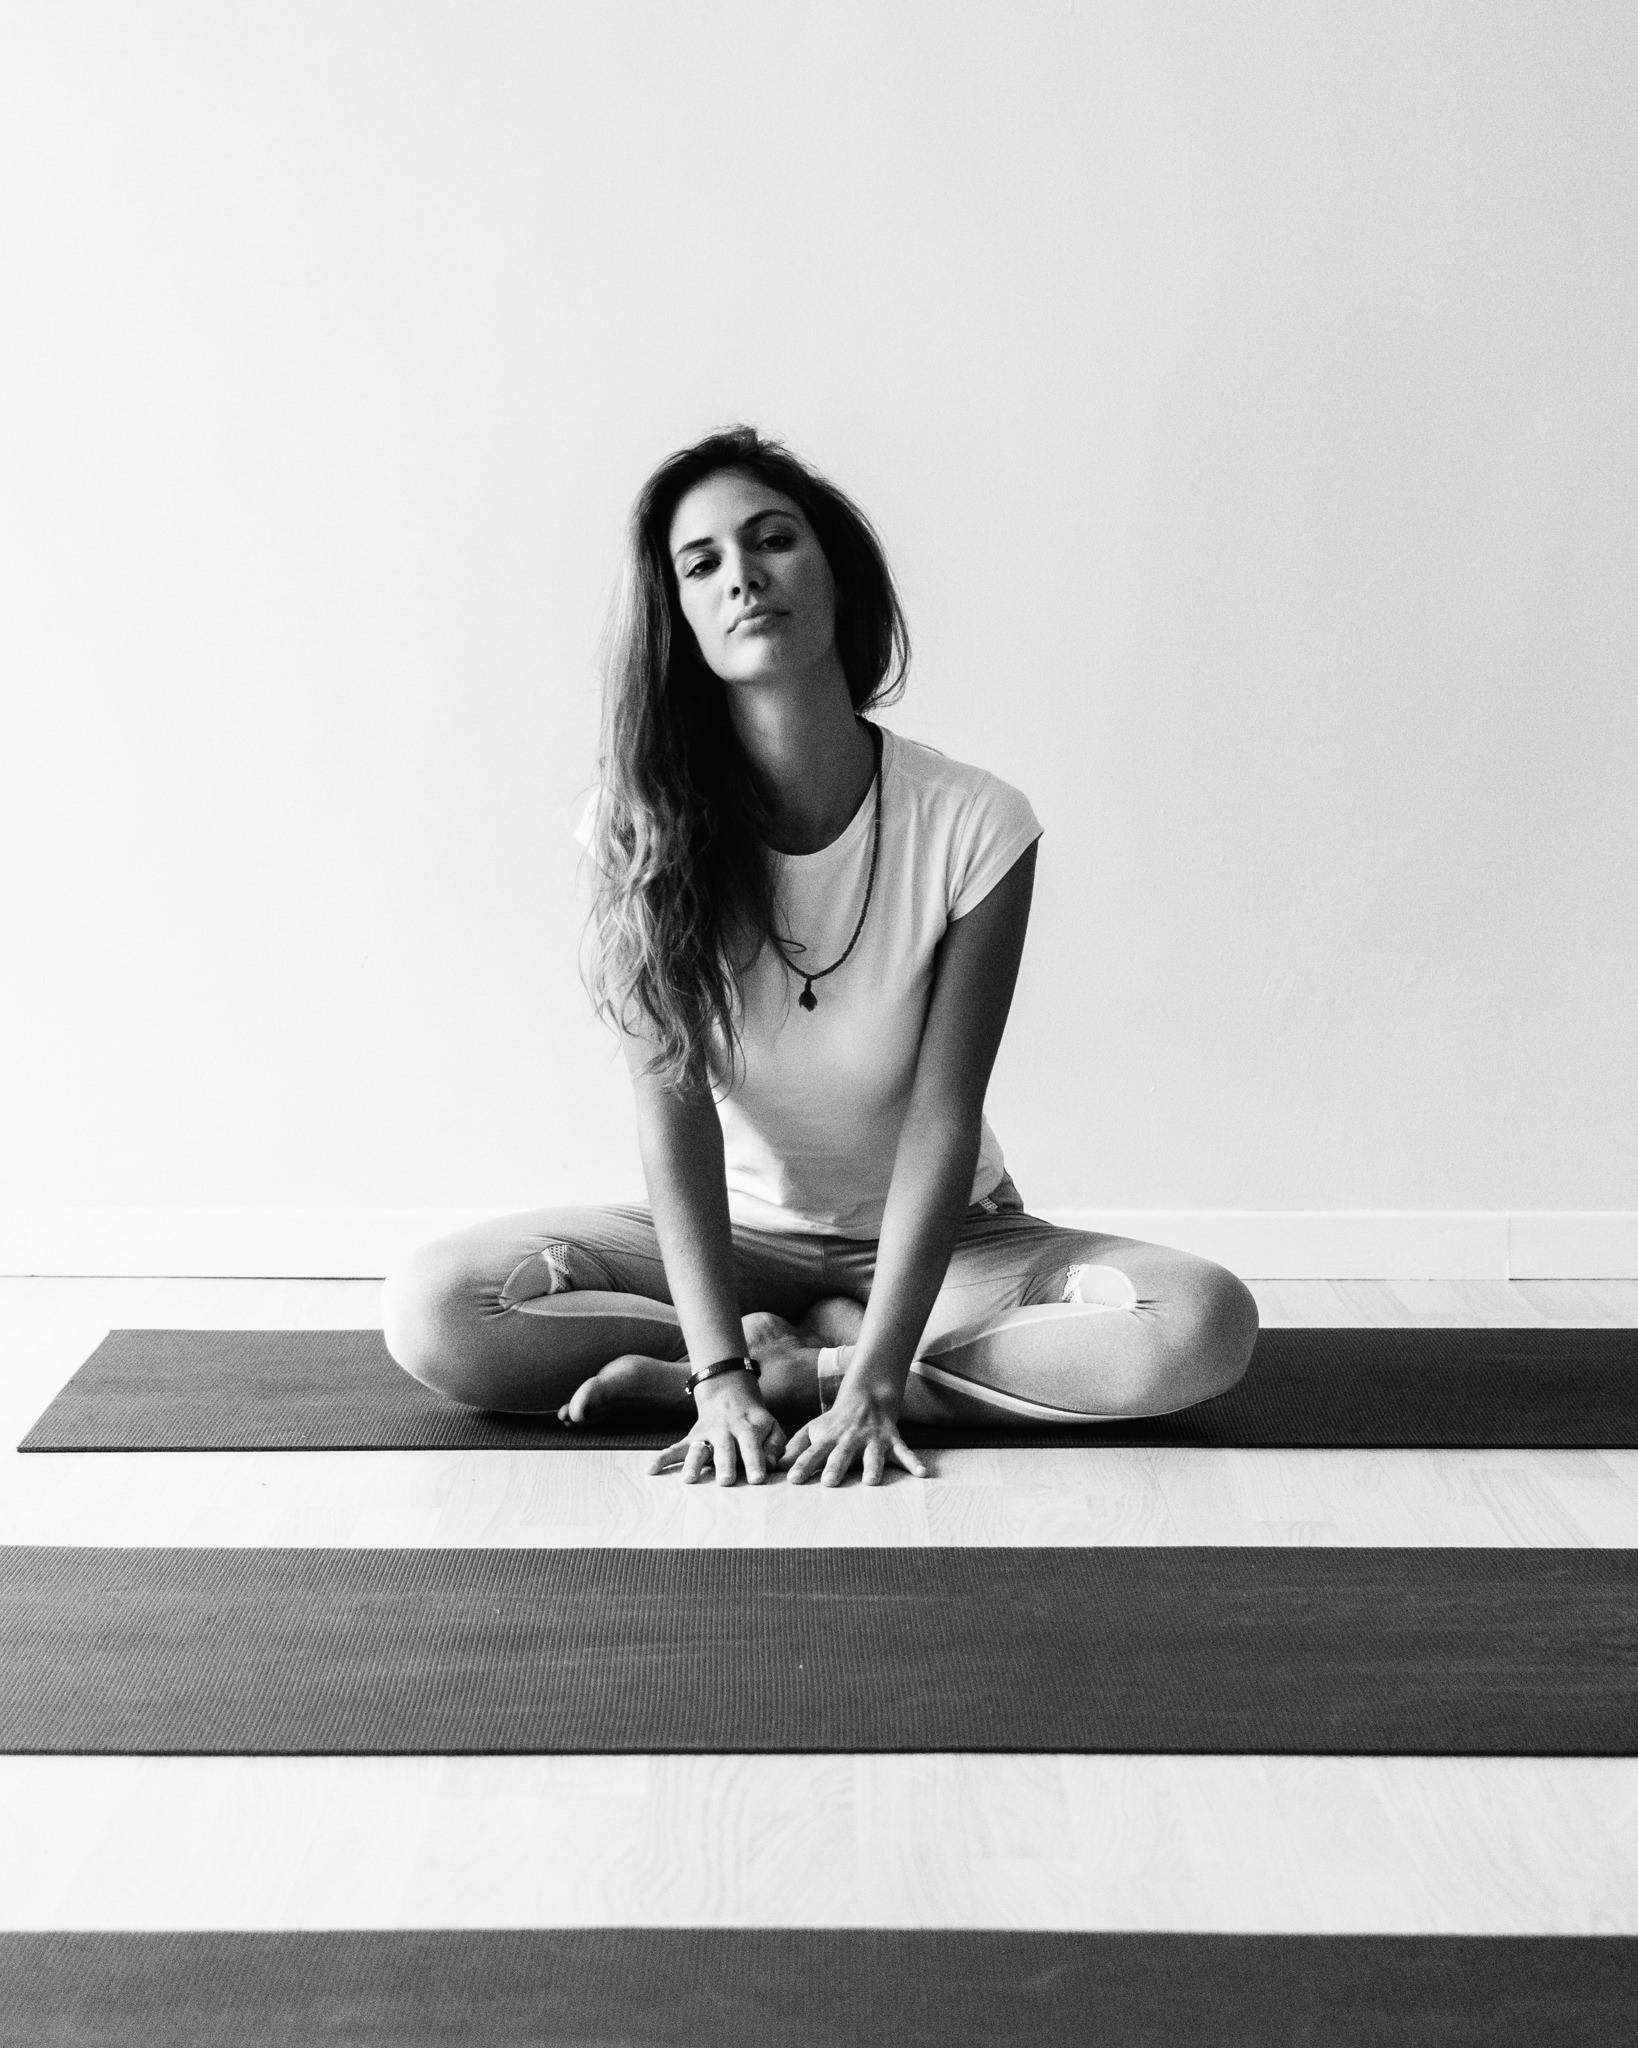 giulia_yoga_meditazione_torino-7.jpg